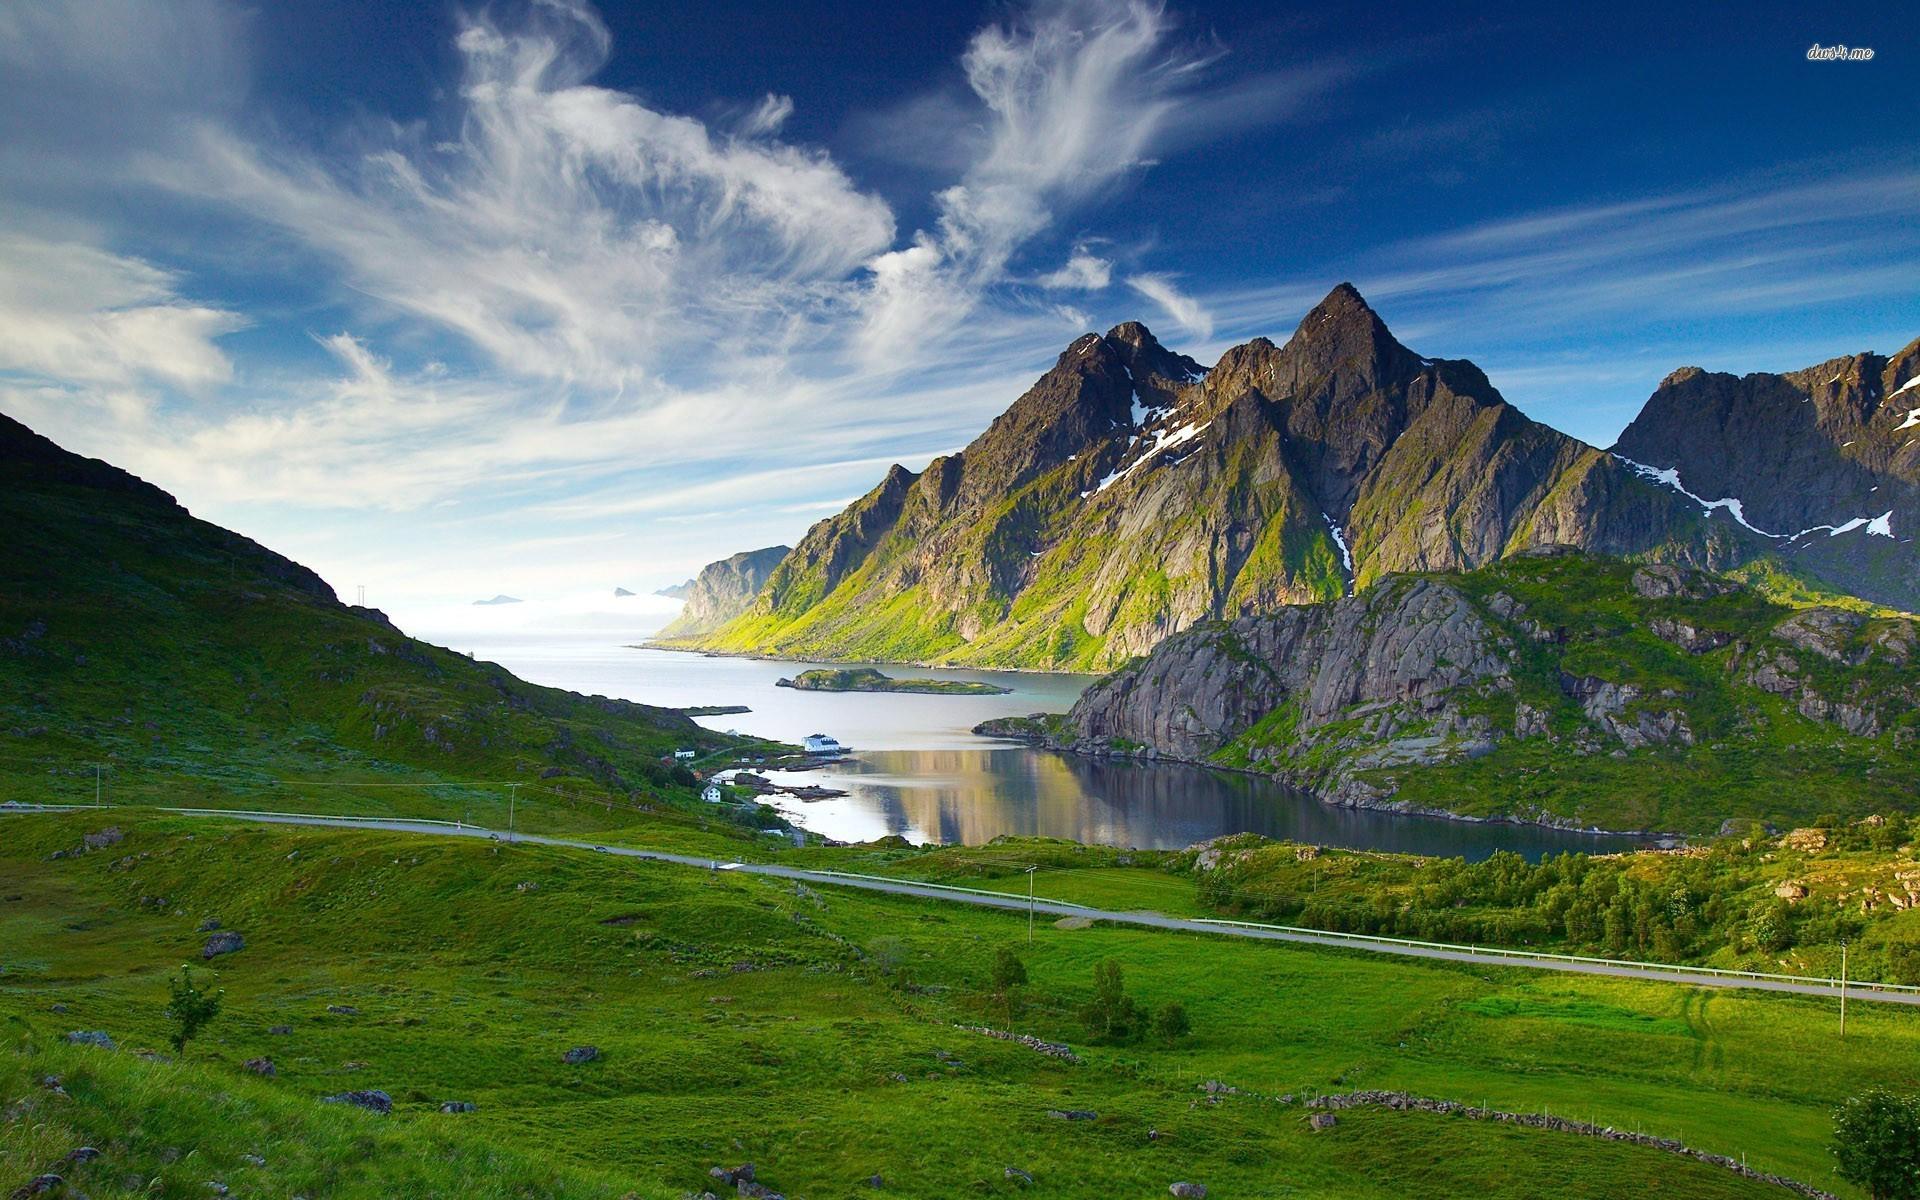 Mountain Landscape Wallpaper Widescreen 2 HD Wallpapers